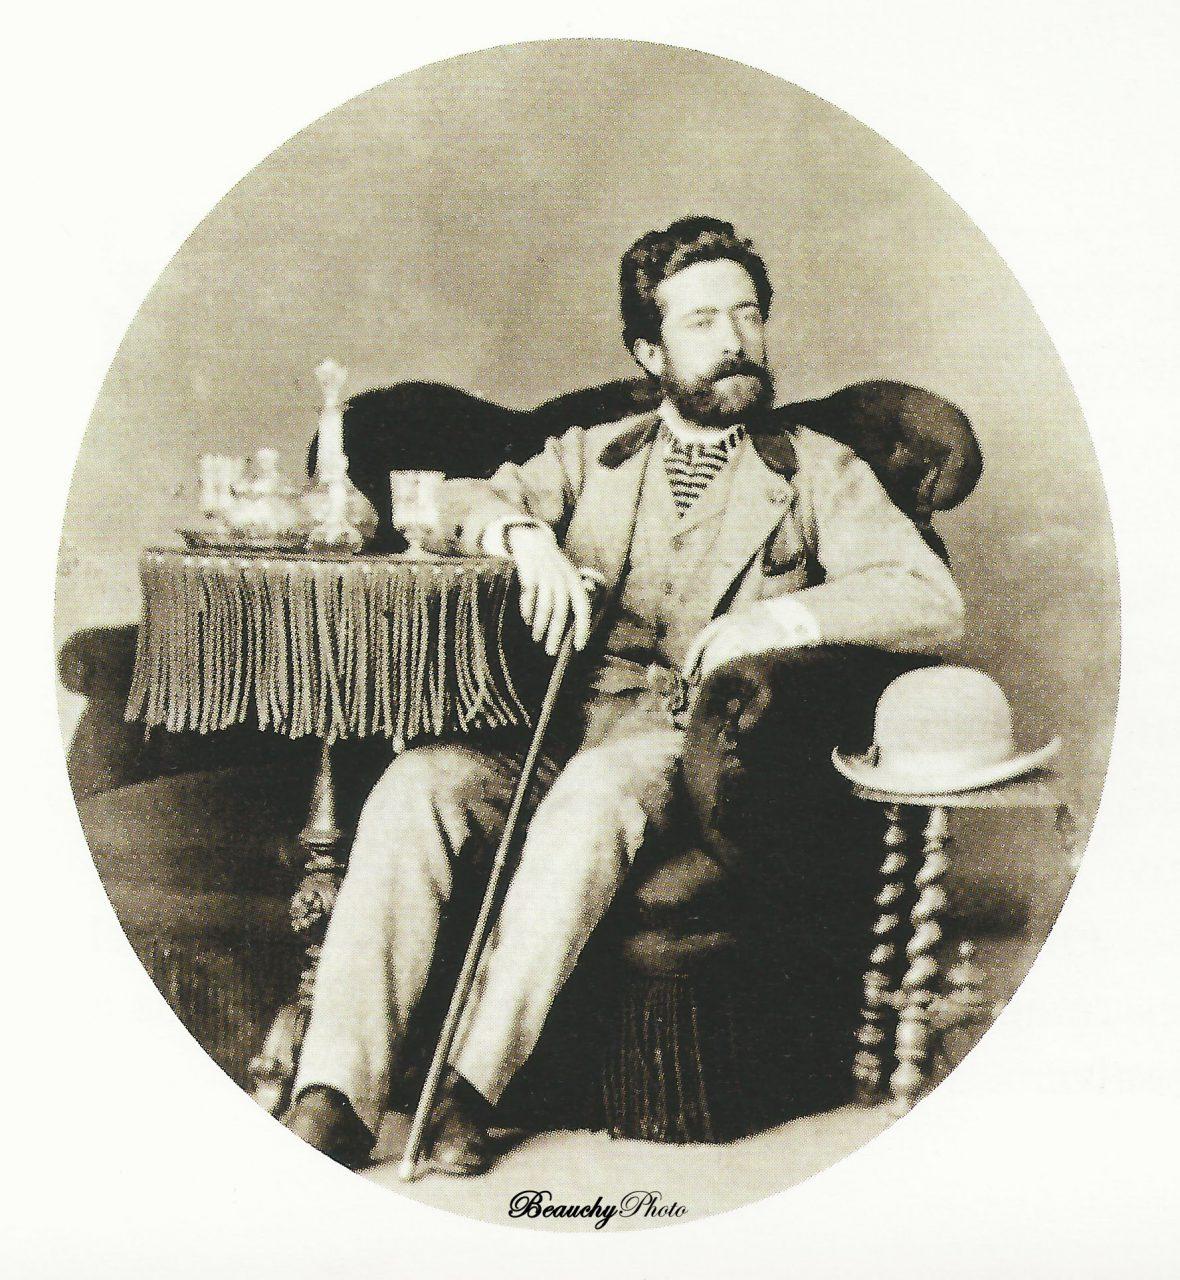 beauchyphoto_marques_de_la_granina-sevilla_1858_julio_beauchy_peron_fotografias_antiguas_postales_retratos